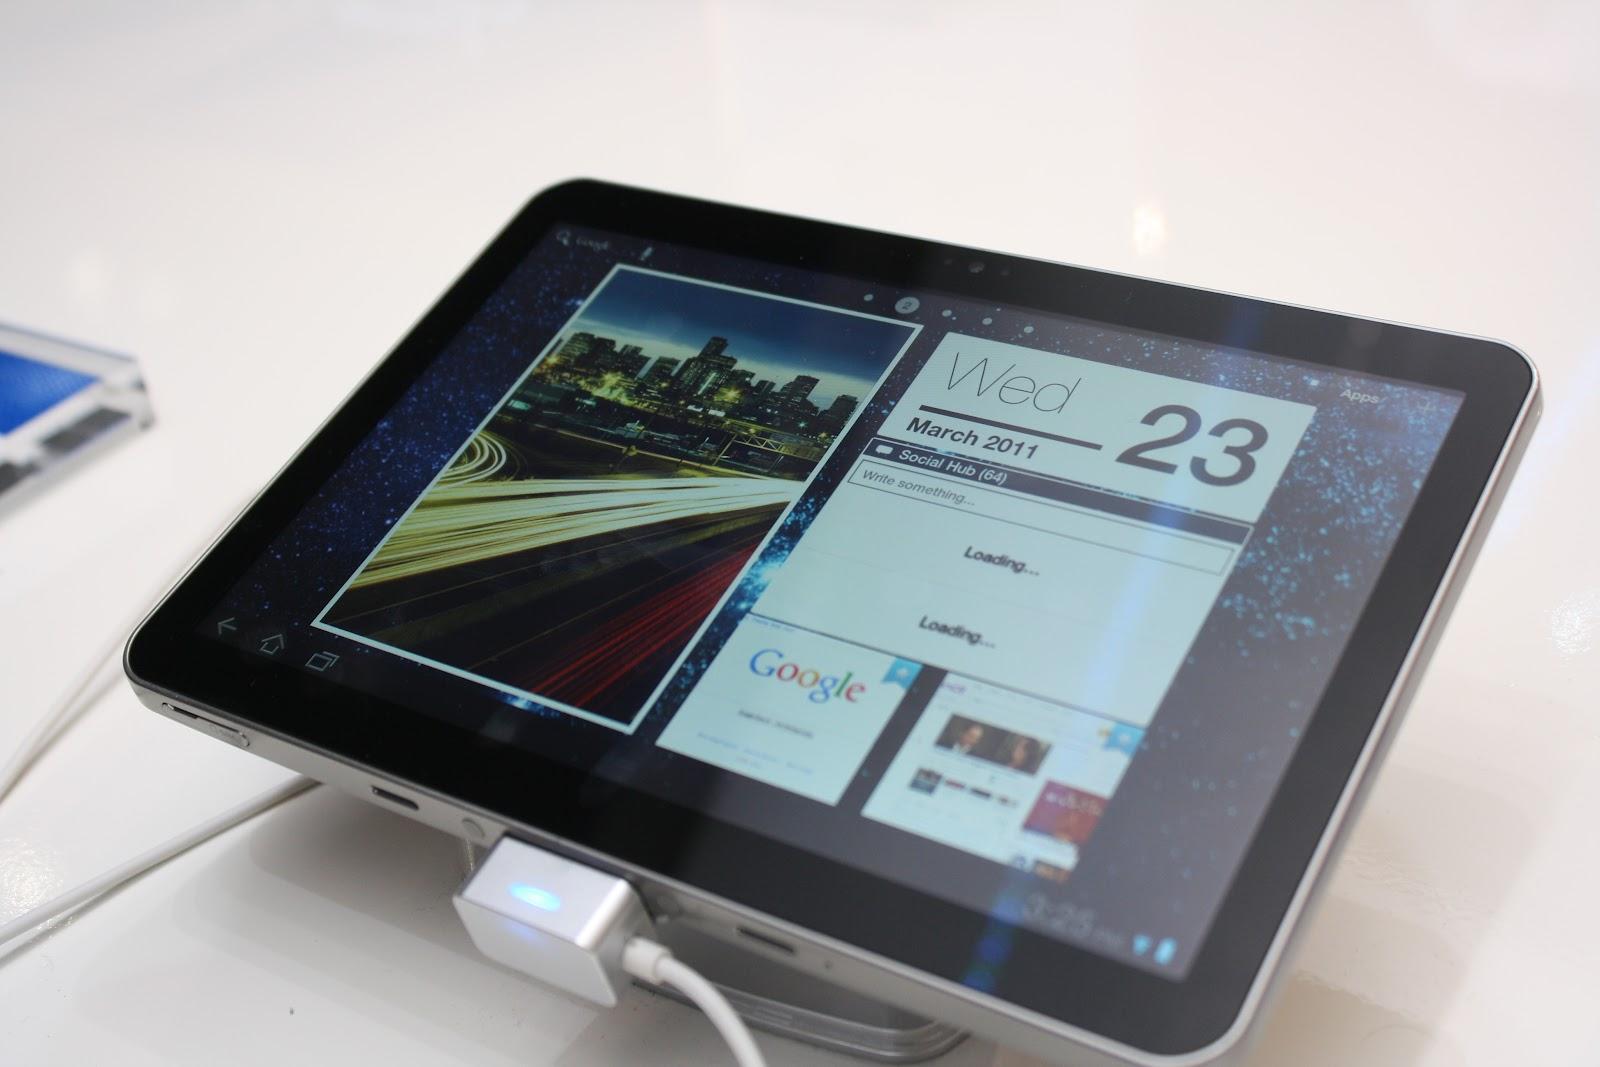 http://3.bp.blogspot.com/-1wNwvLs_Mgc/UEQSATzcpXI/AAAAAAAAAXs/CDfIGv36O1Q/s1600/Samsung+Galaxy+Tab+8.9+CTIA.jpg